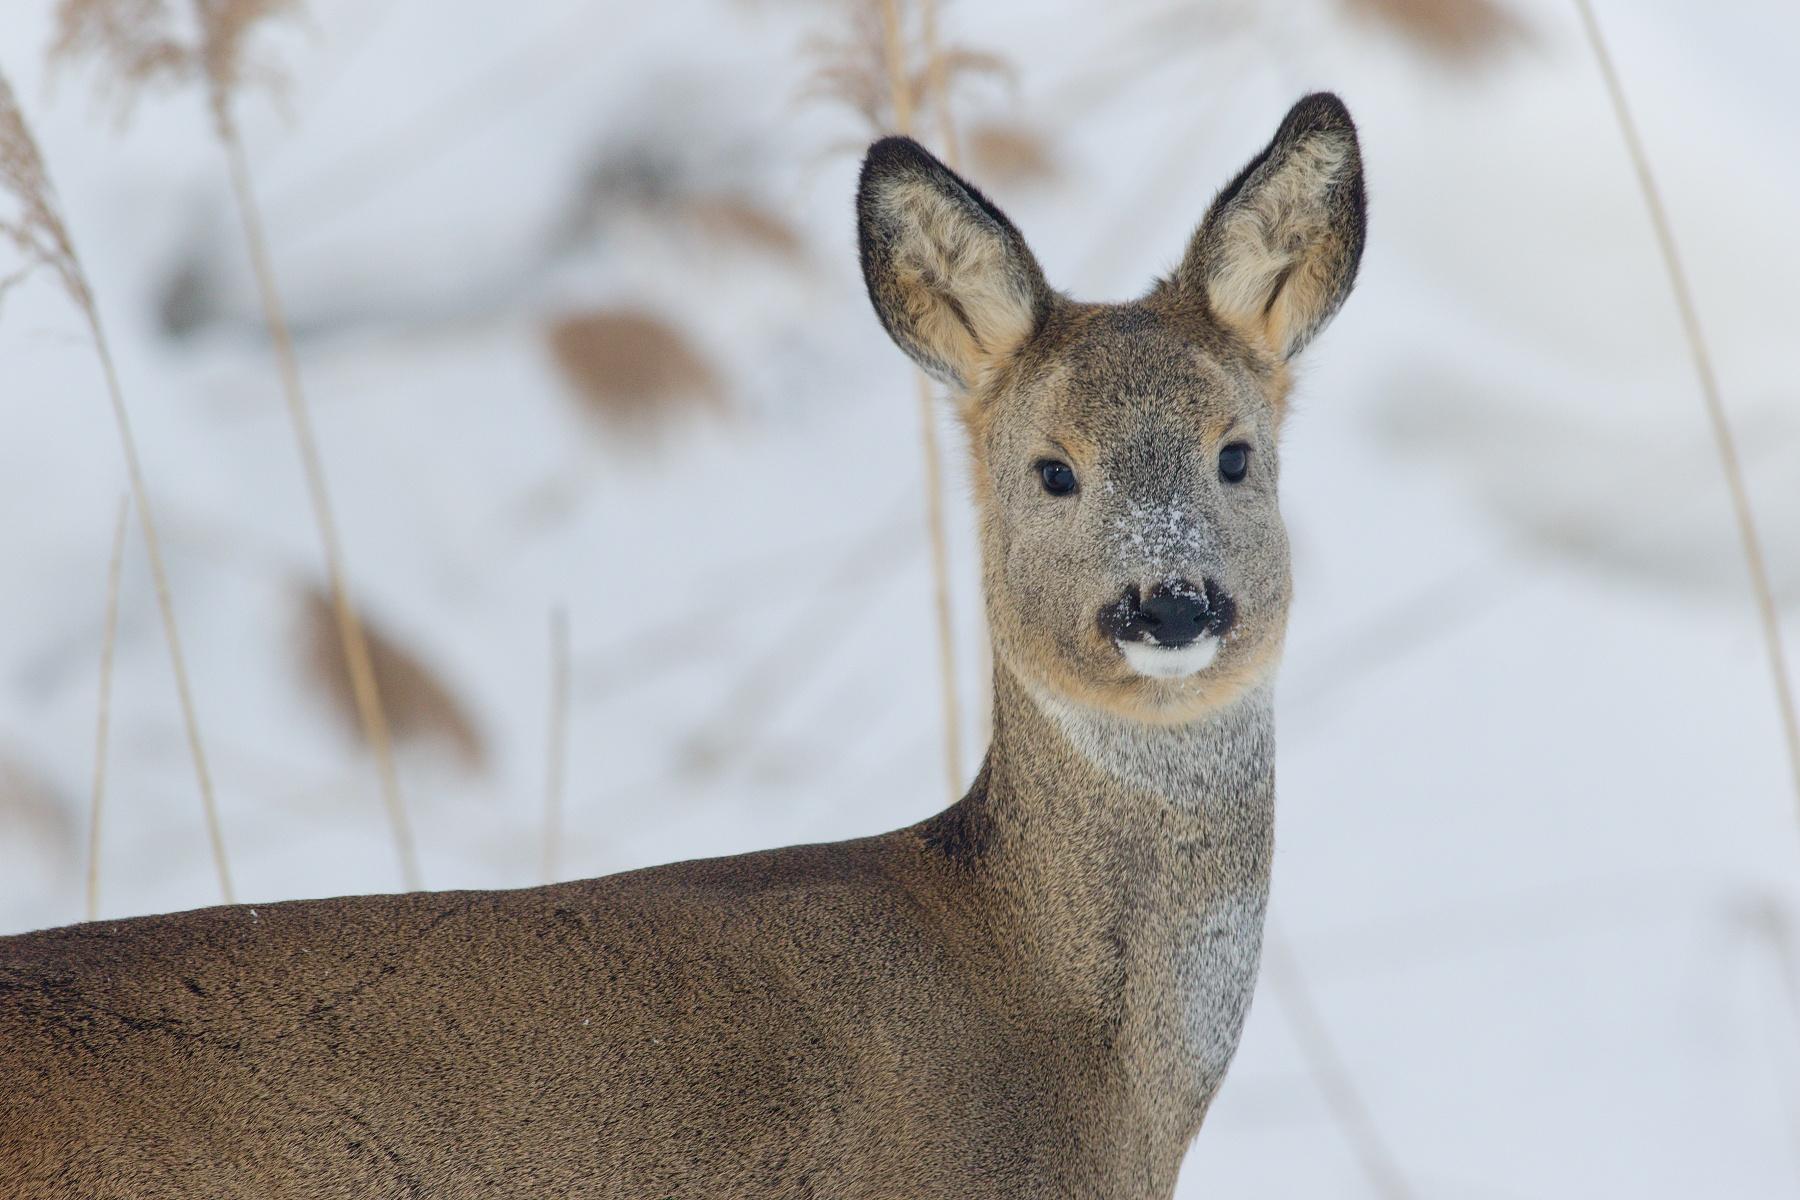 srnec lesný (Capreolus capreolus) Roe deer, NPR Kláštorské lúky, Turčianska kotlina, Slovensko